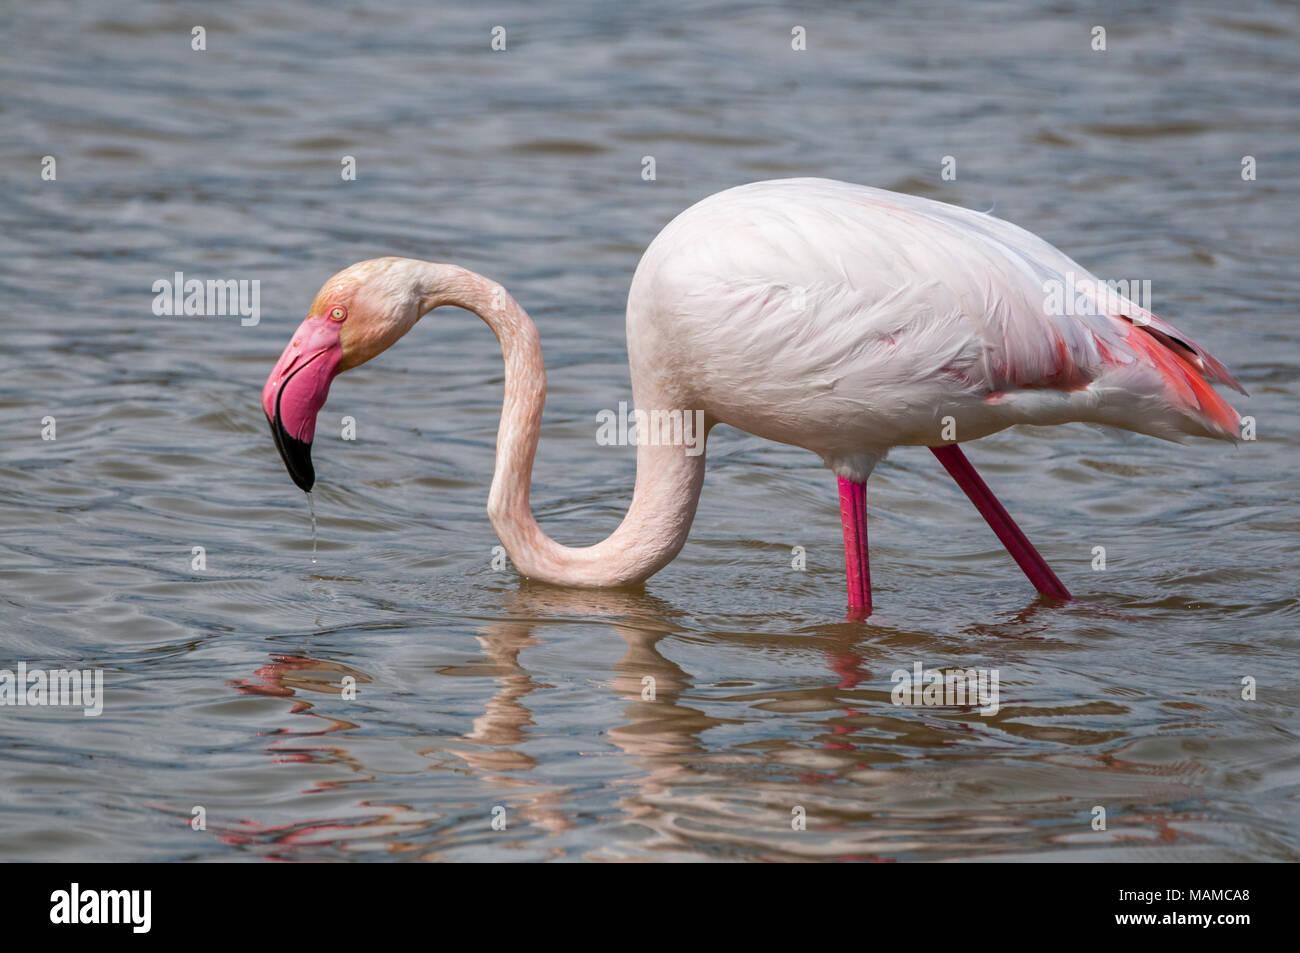 greater flamingo, Phoenicopterus roseus, Aiguamolls Emporda, Catalonia, Spain - Stock Image